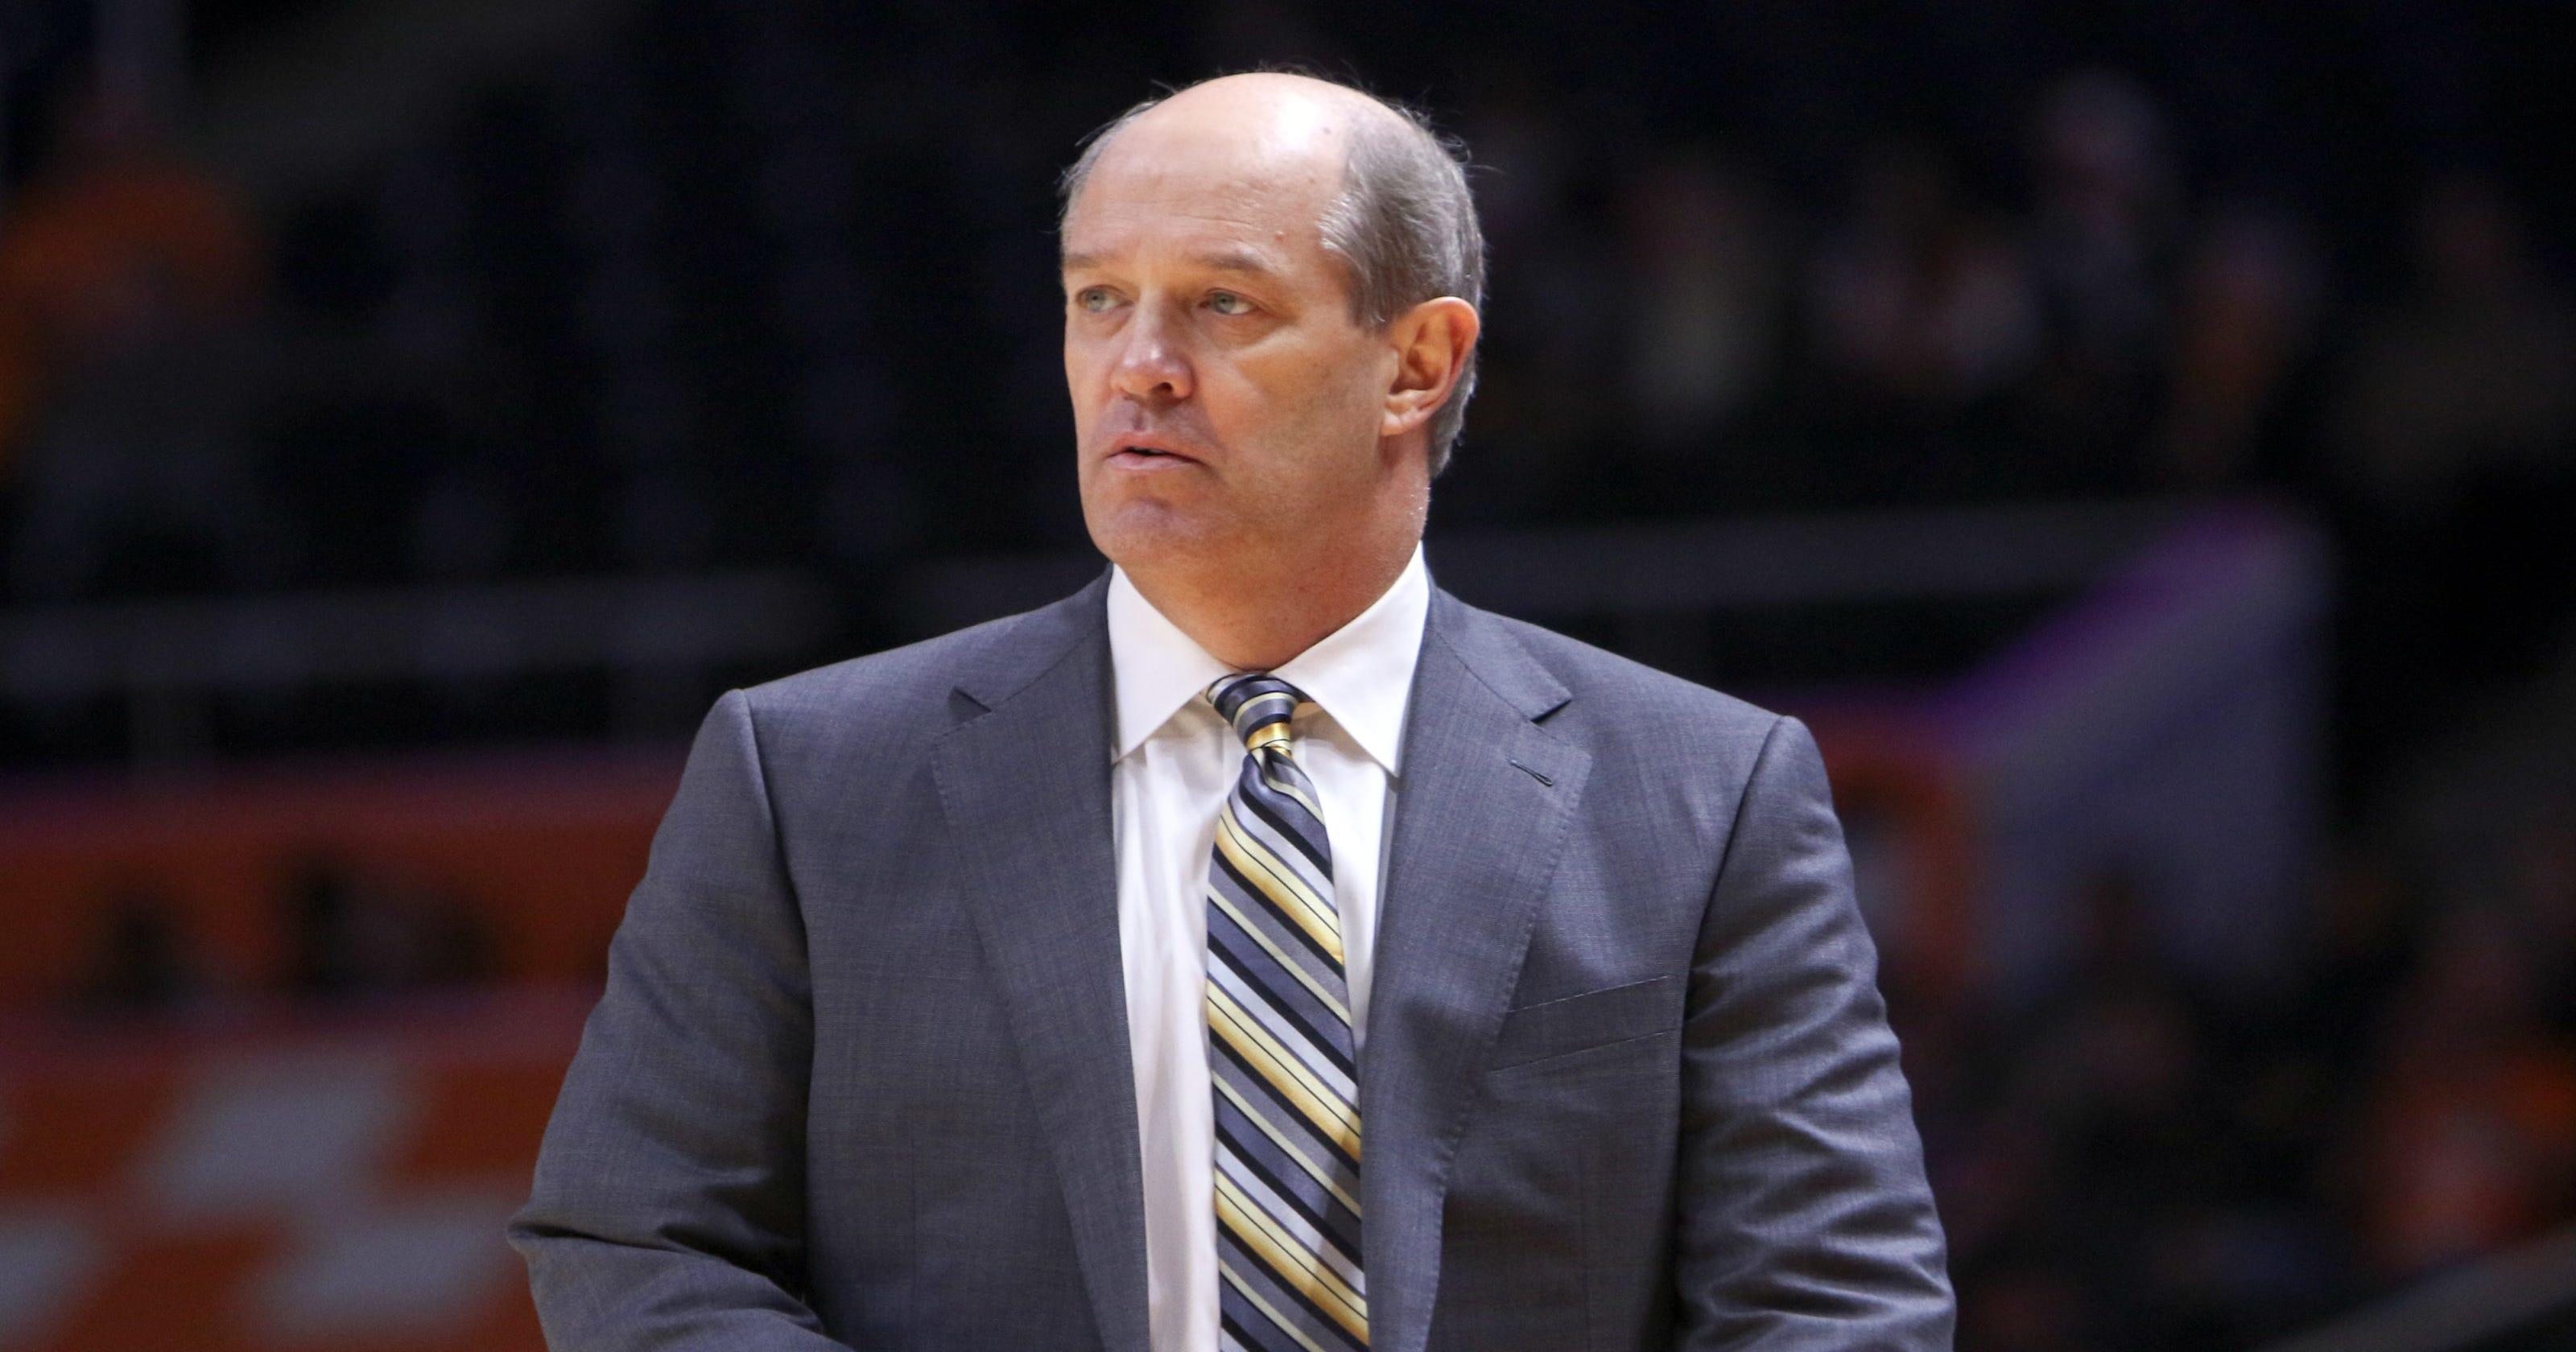 Kevin Stallings Leaves Vanderbilt For Pittsburgh